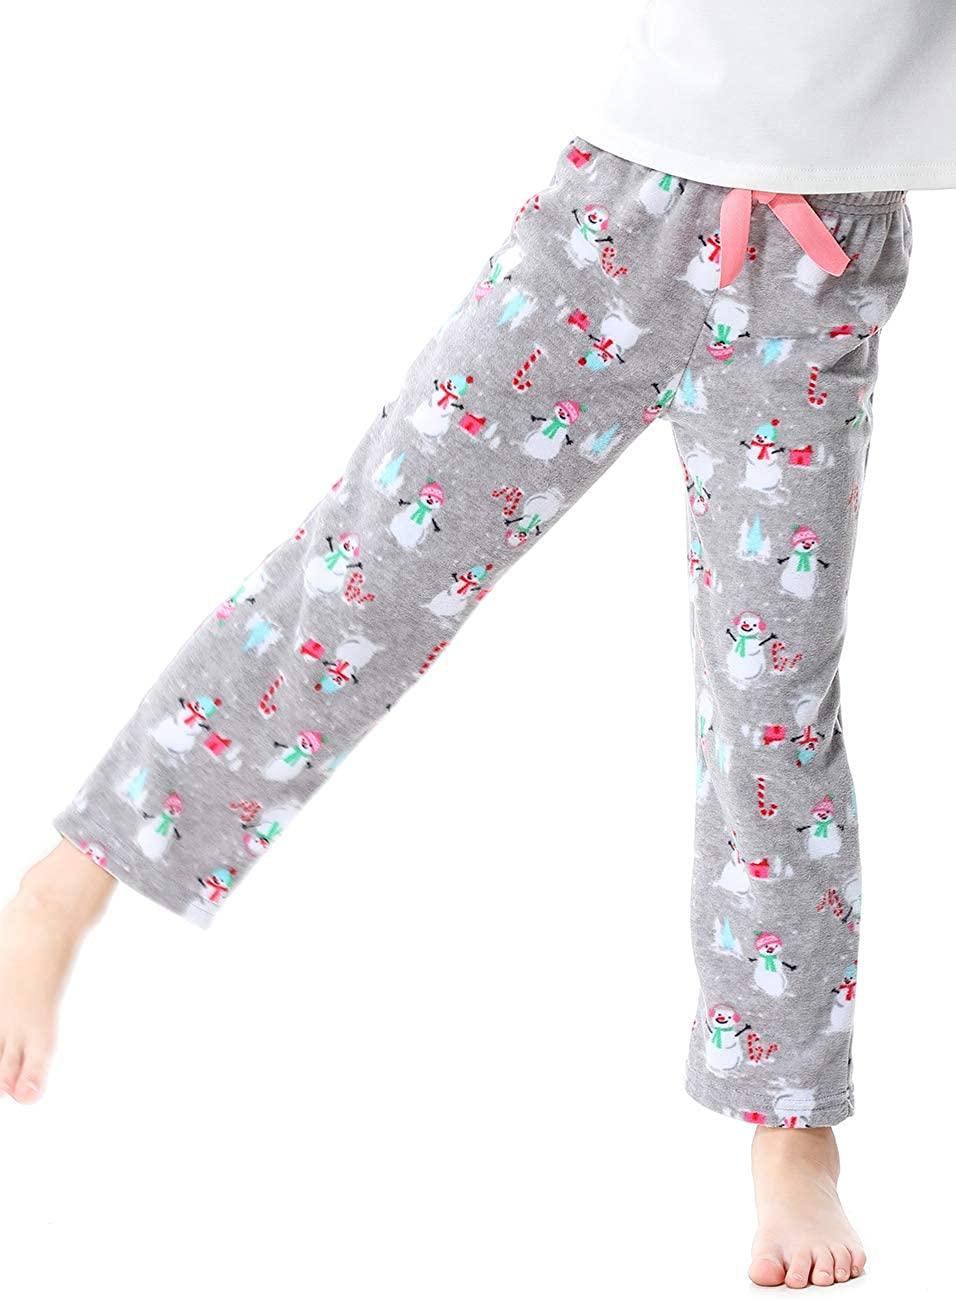 OLEH-OLEH Girls Pajama Pants, Flannel Lounge Pajama Bottoms, with Bow and Elastic Waist (Gray/Snowman, 4T)